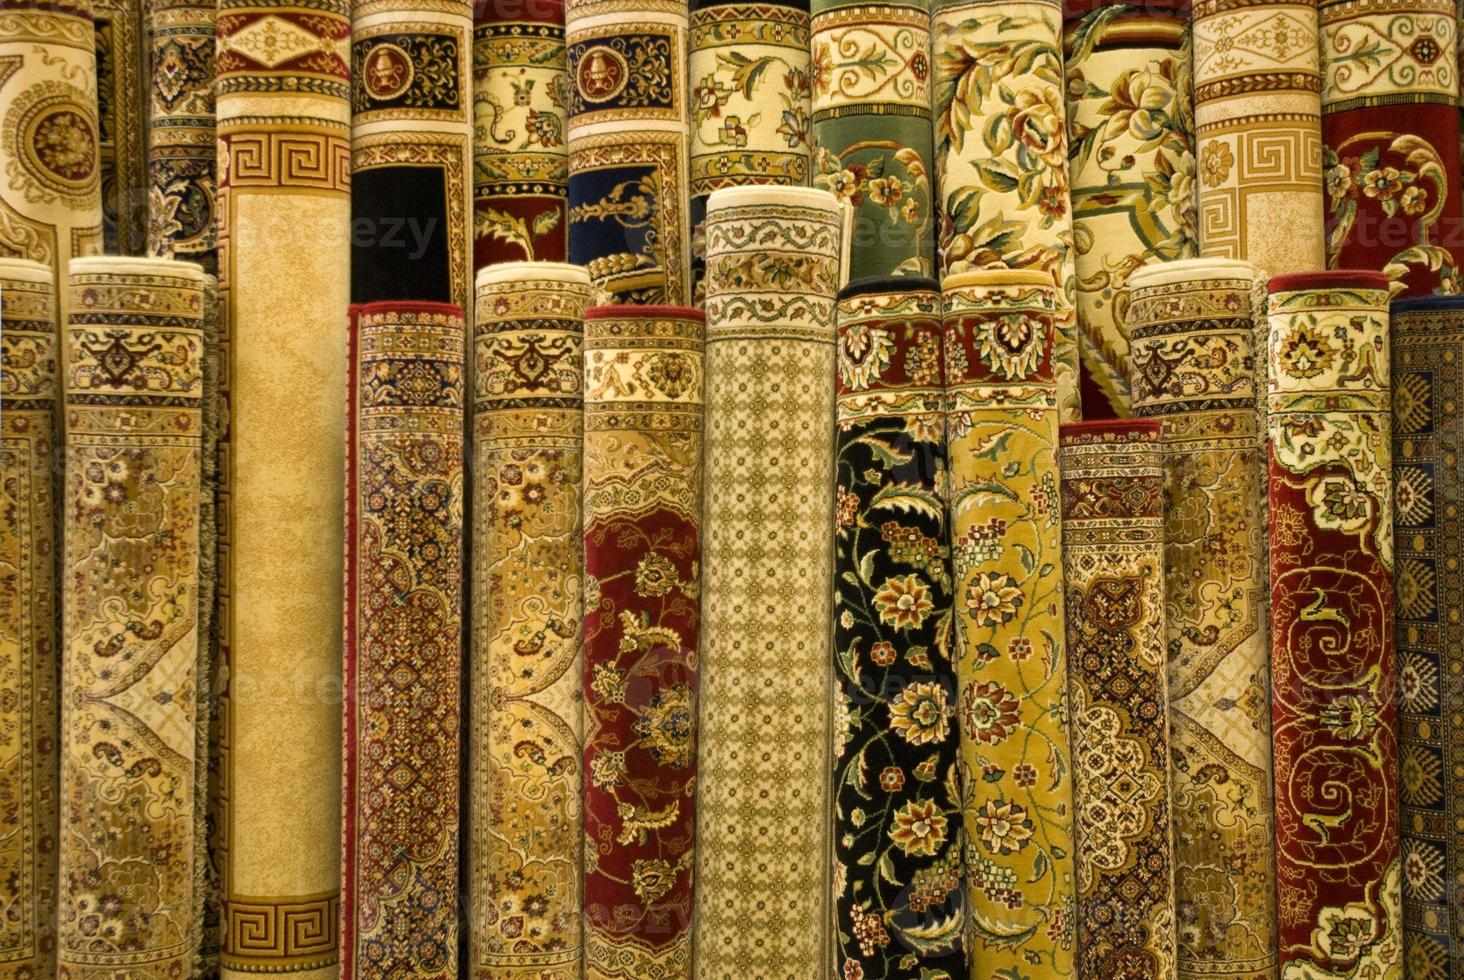 tapis persans exposés photo